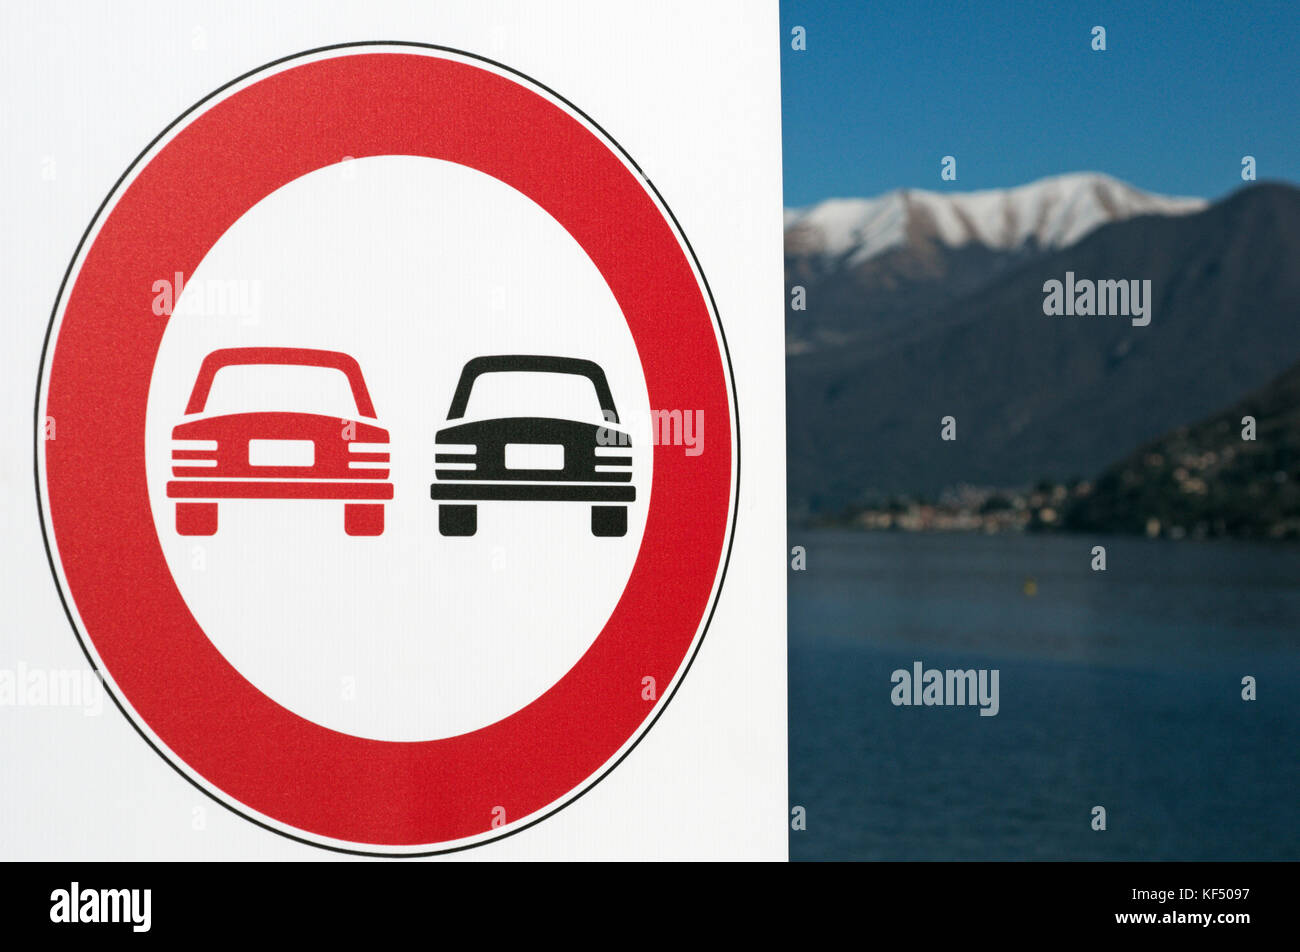 no overtaking warning sign, Lake Como, Italy - Stock Image